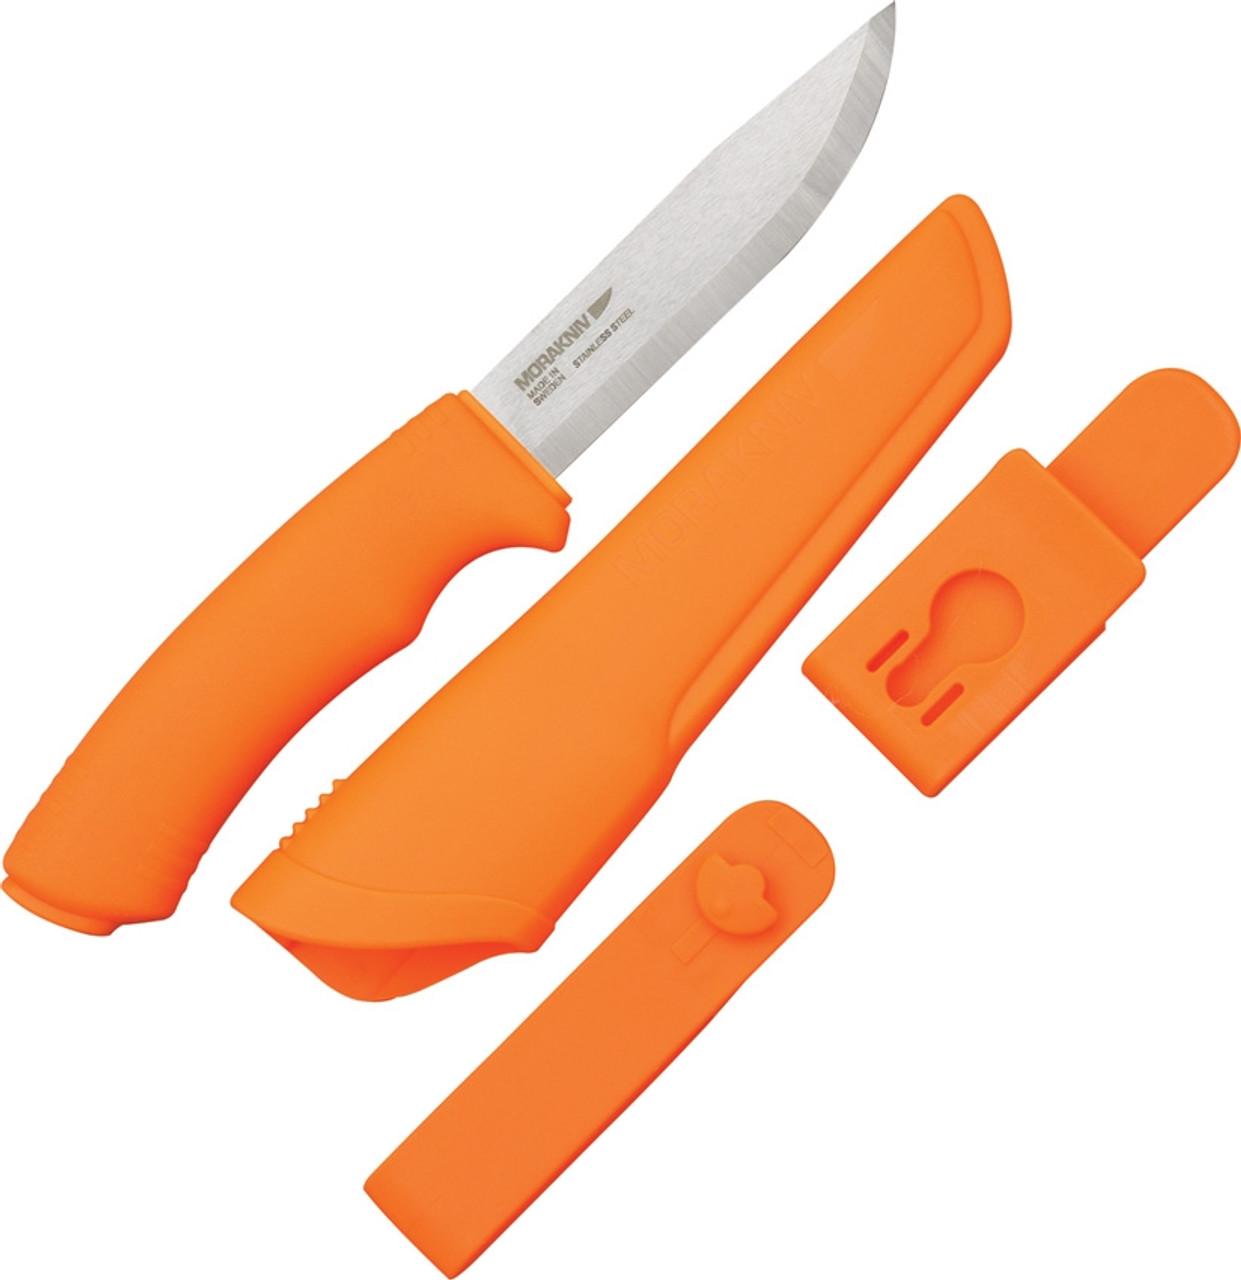 Mora Bushcraft, Orange Handle & Sheath, Stainless Steel Blade